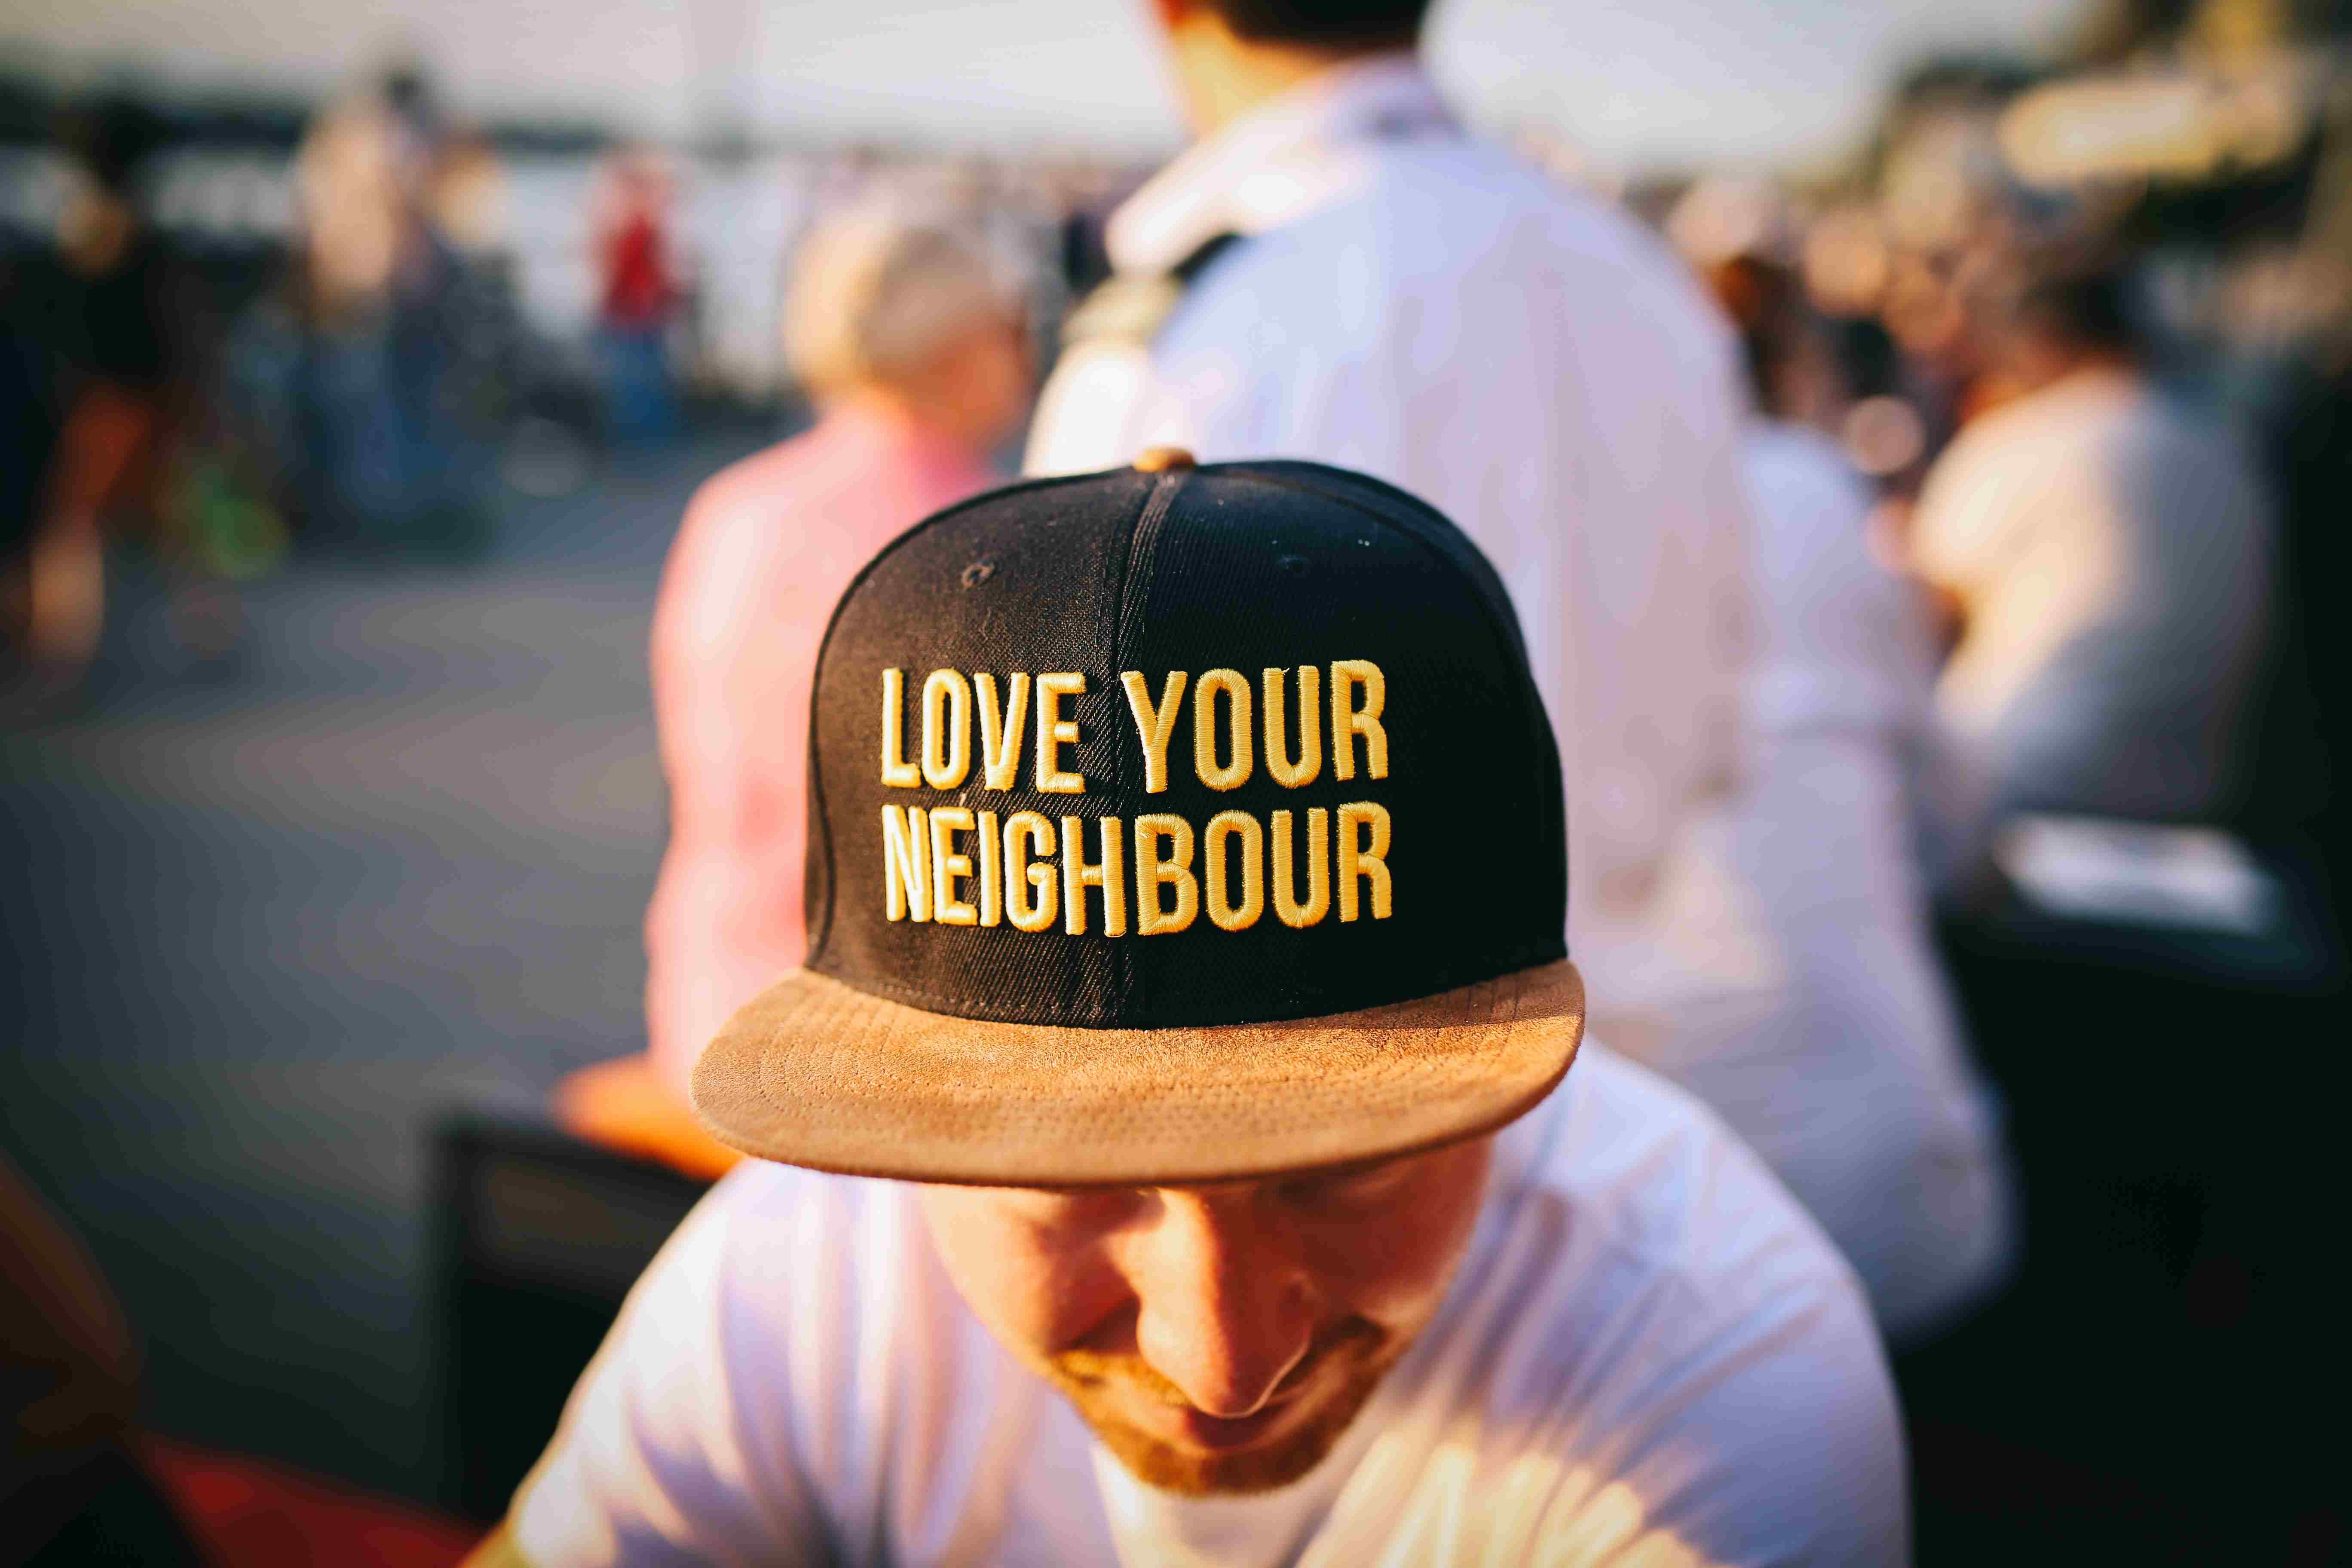 Love your neighbor hat photo